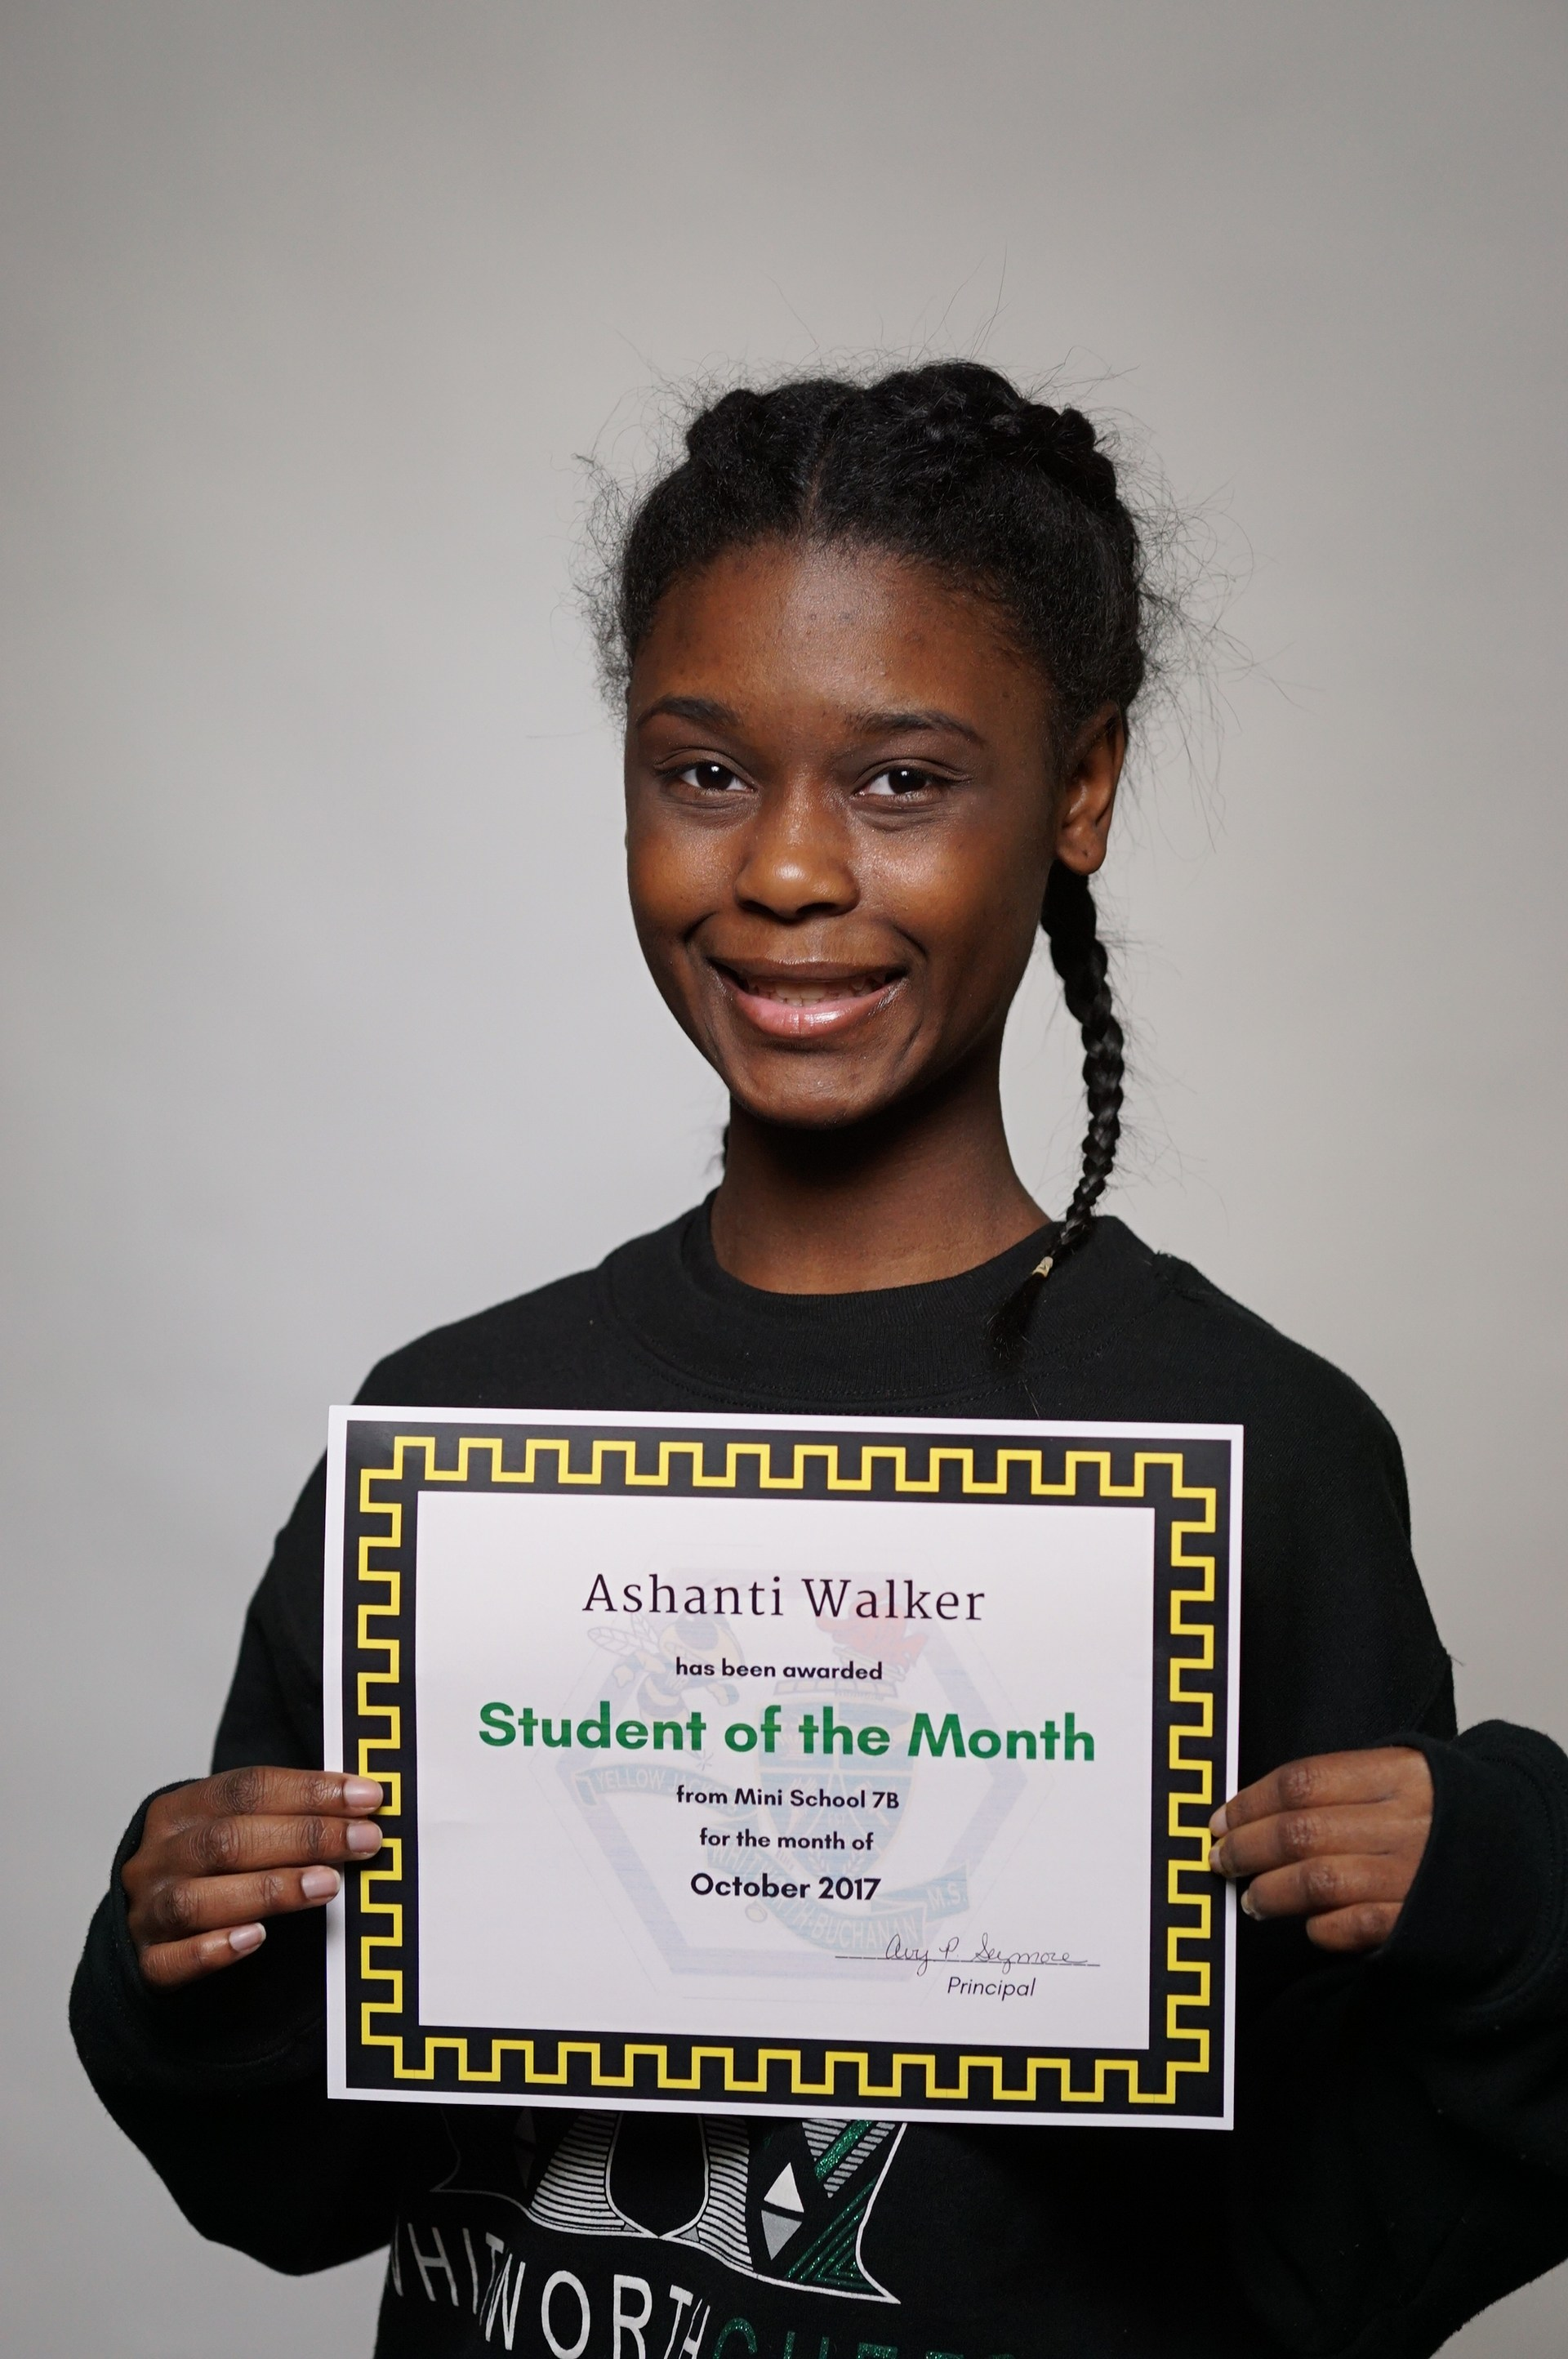 Ashanti Walker